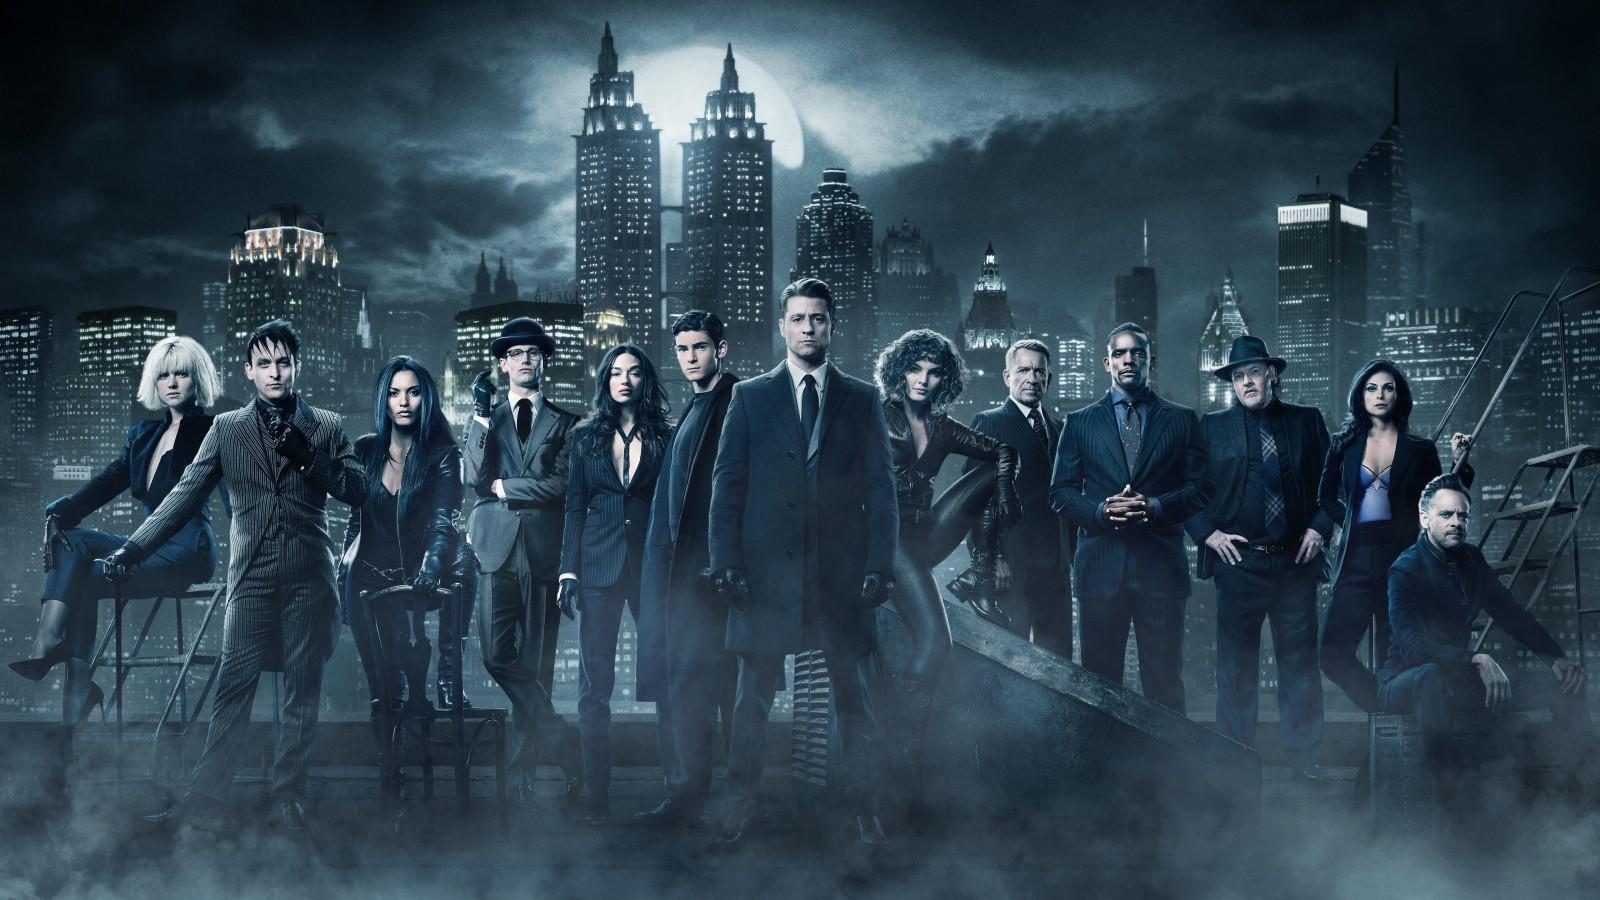 Gotham Season 4 Cast 5K 2017 Wallpapers HD Wallpapers ID 21632